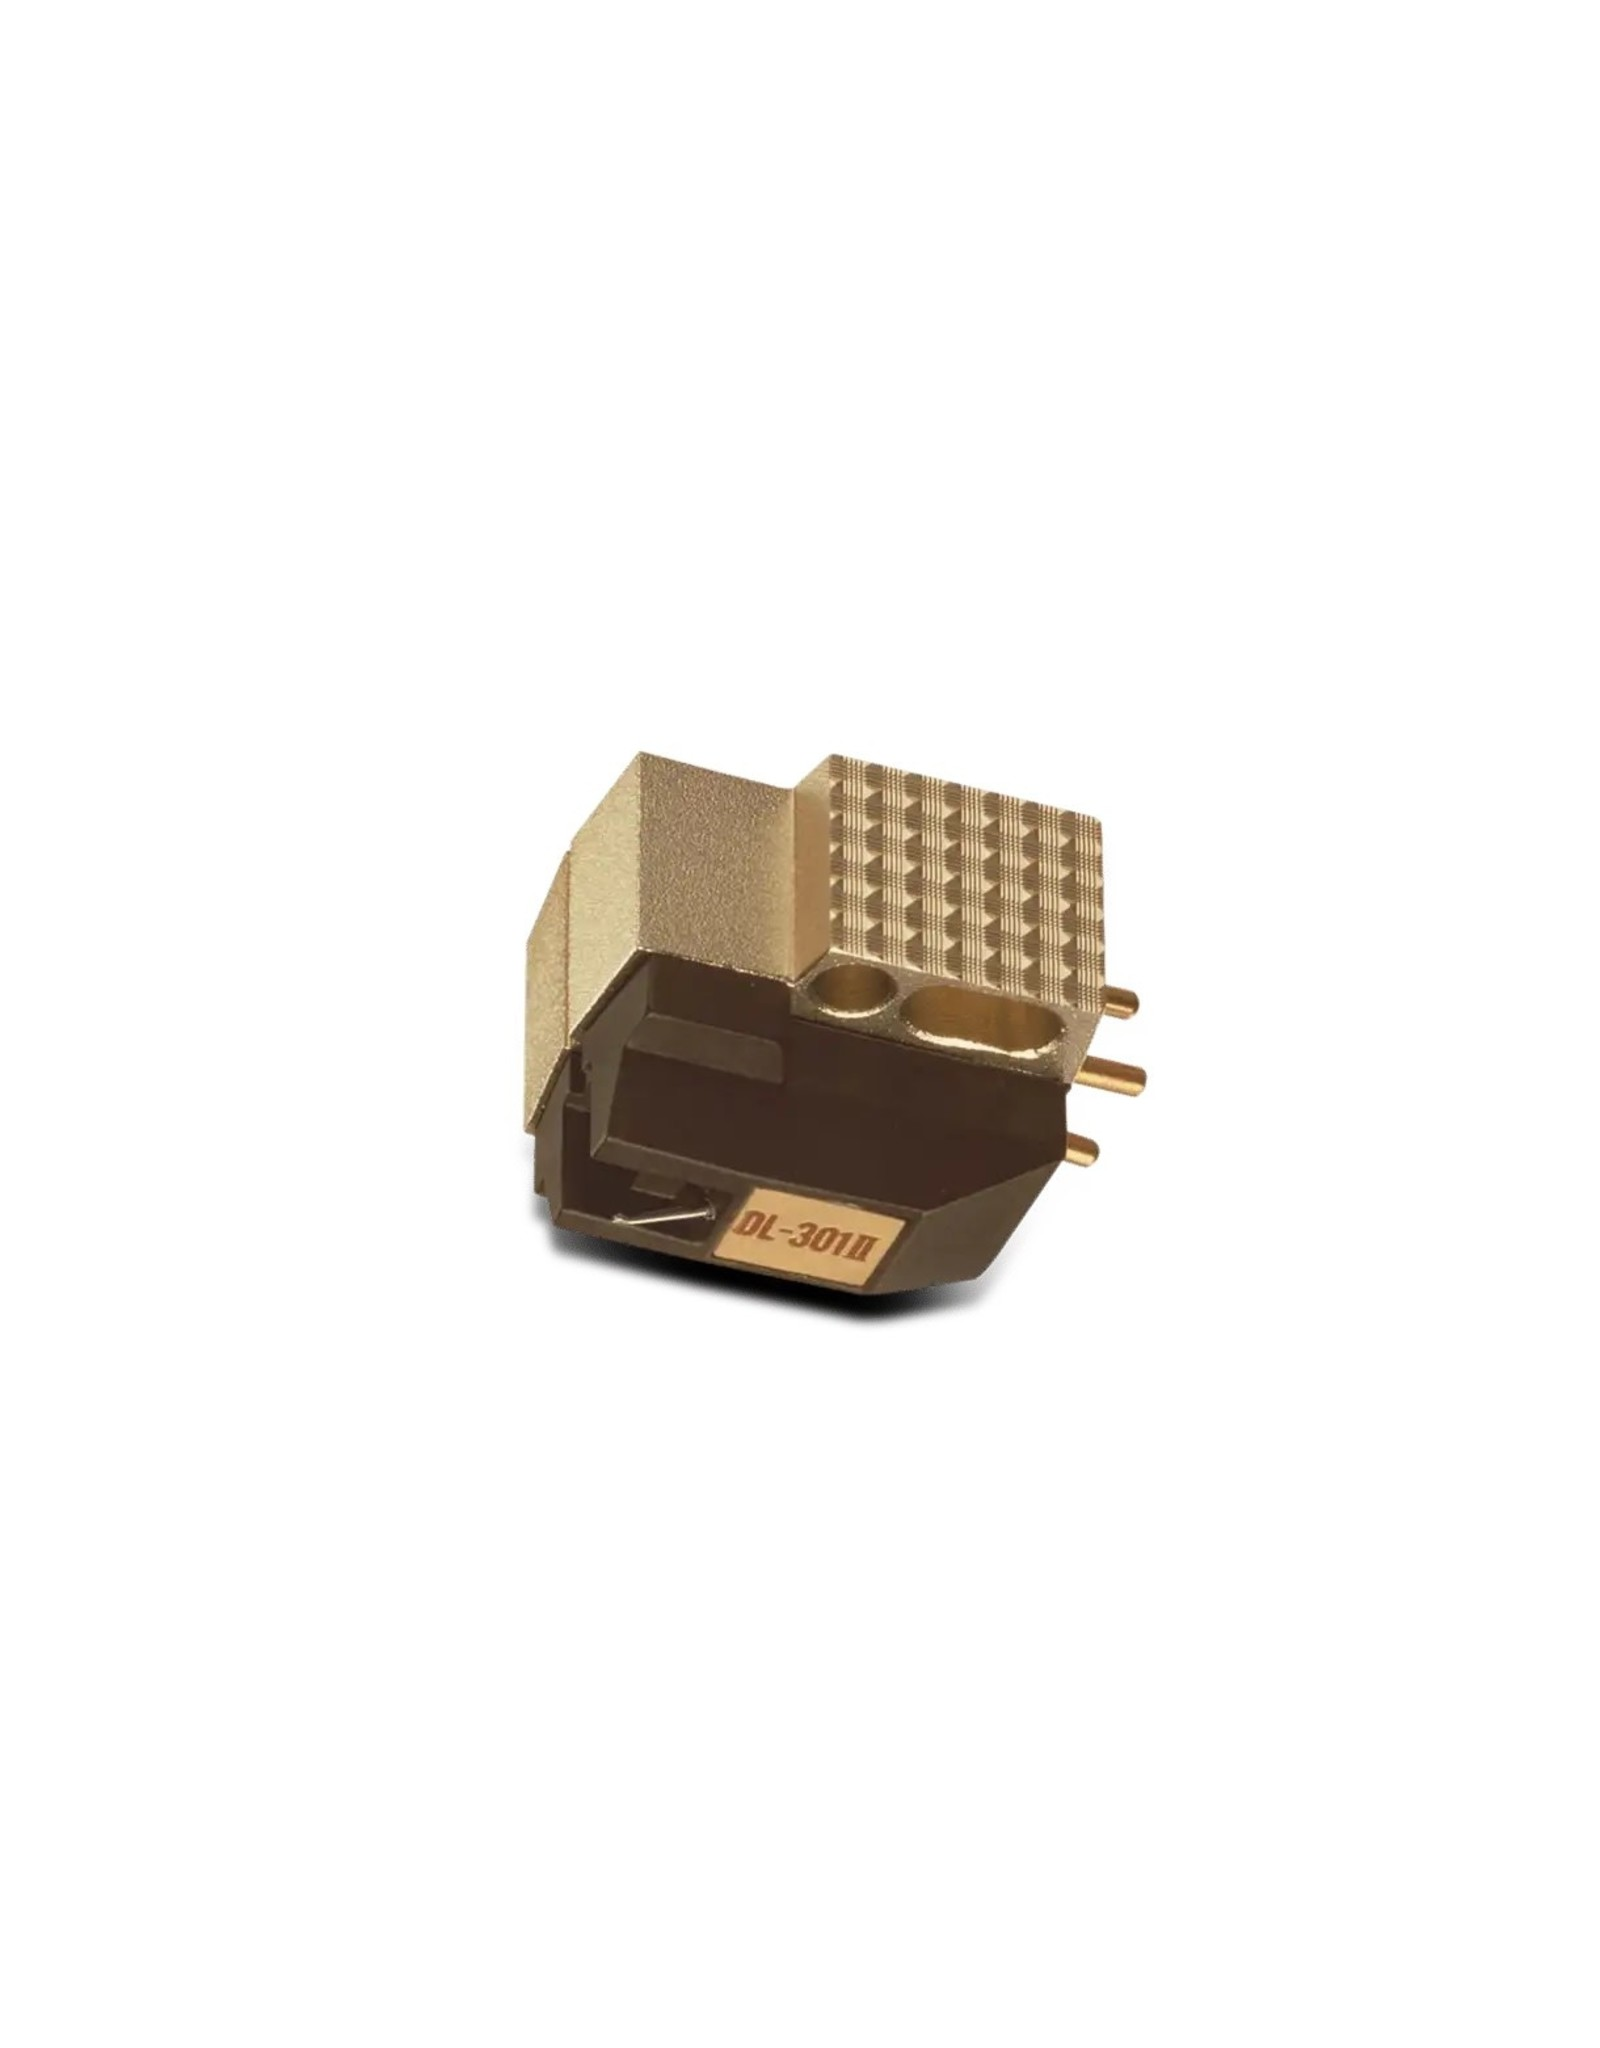 Denon Denon DL-301 II MC Phono Cartridge